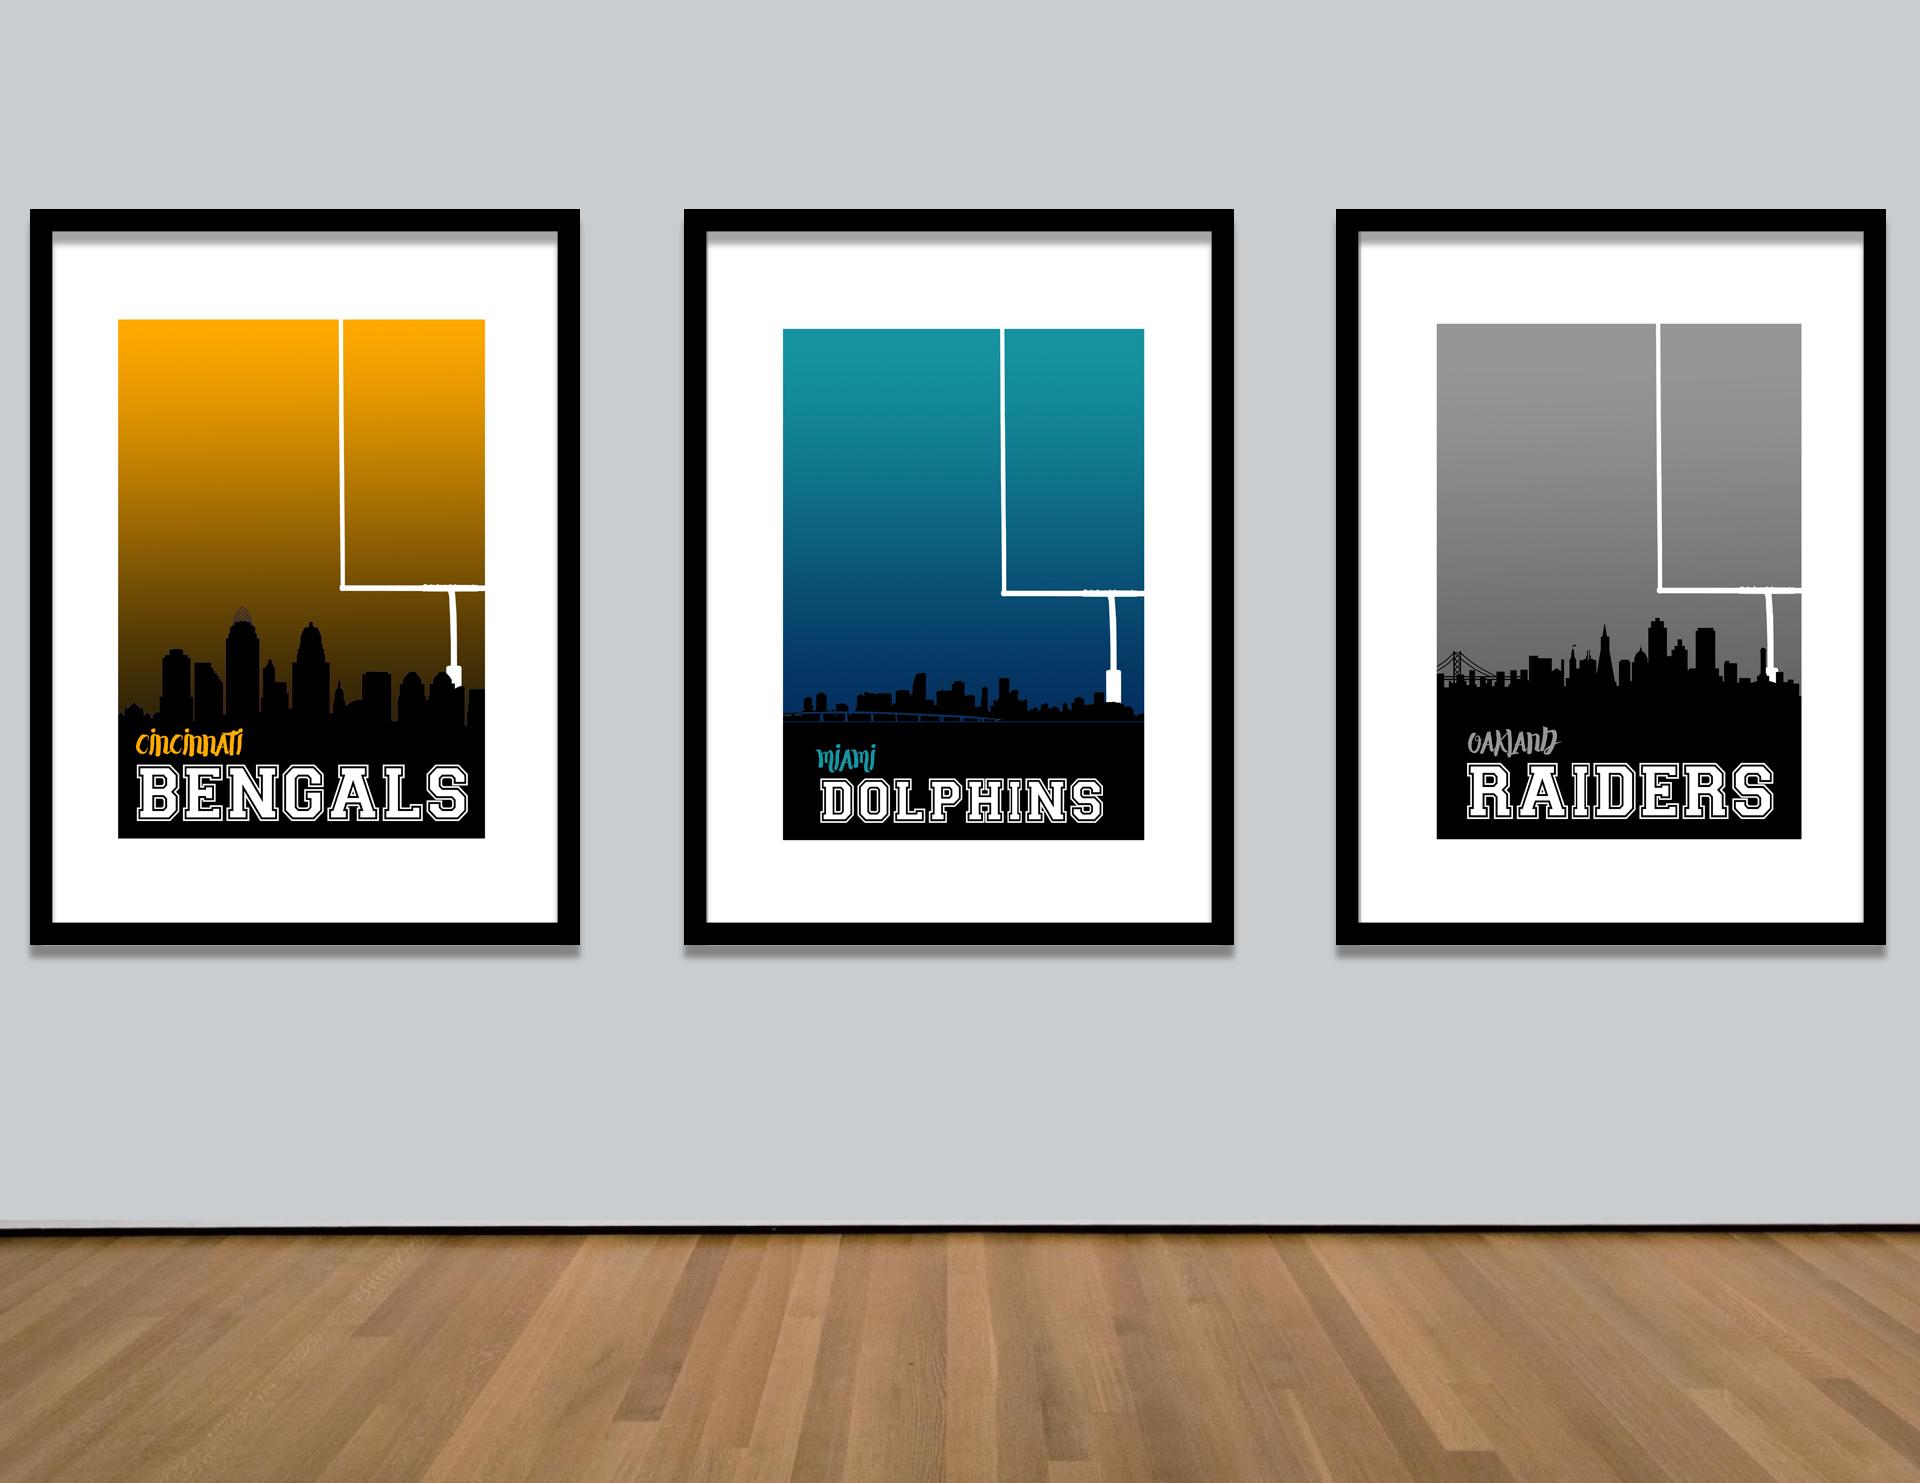 NFL Design Challenge